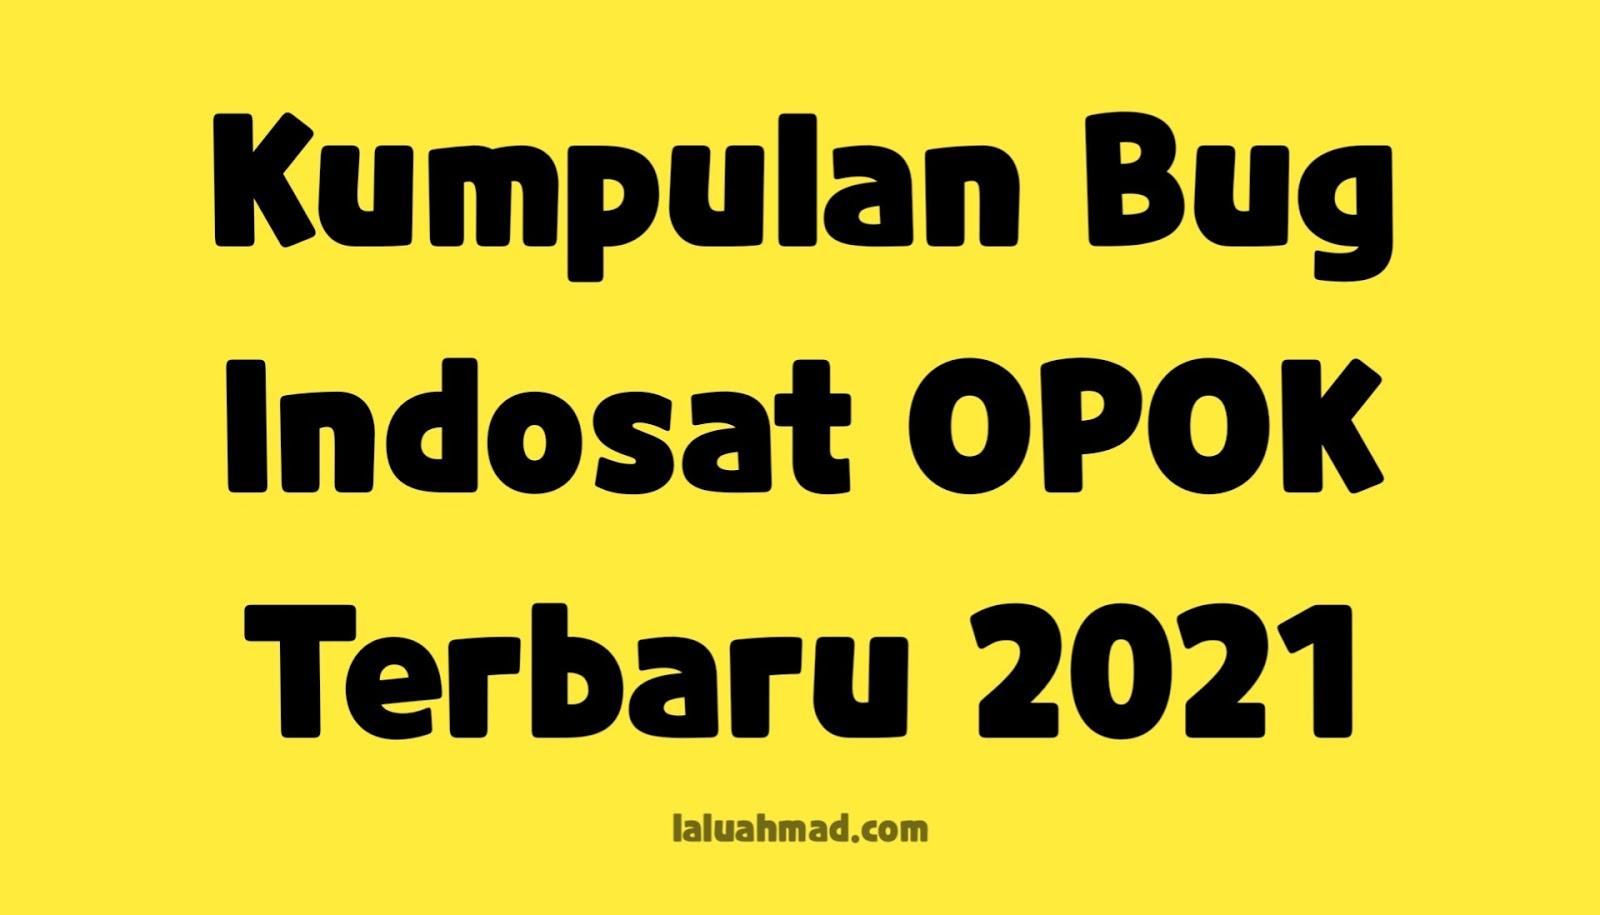 Kumpulan Bug Indosat OPOK Terbaru 2021